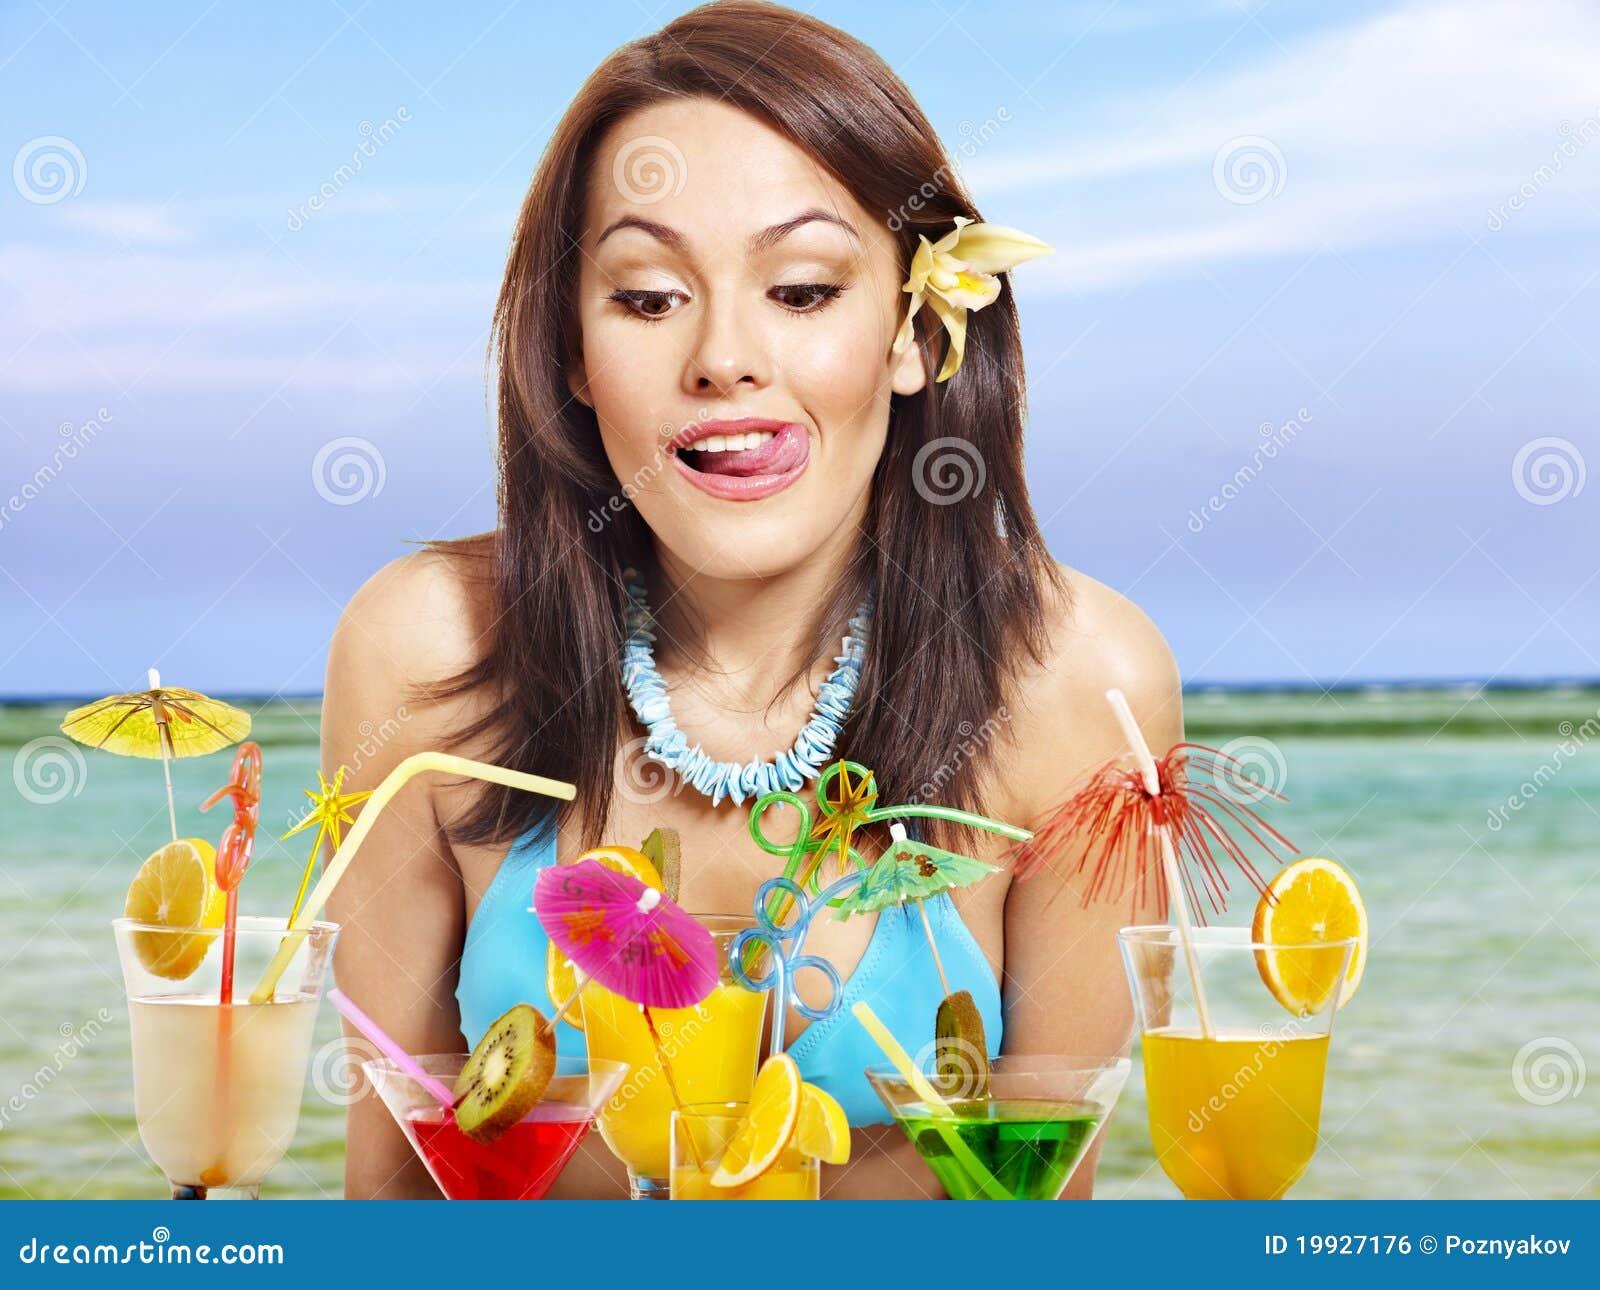 Bikini beach free videos idea very